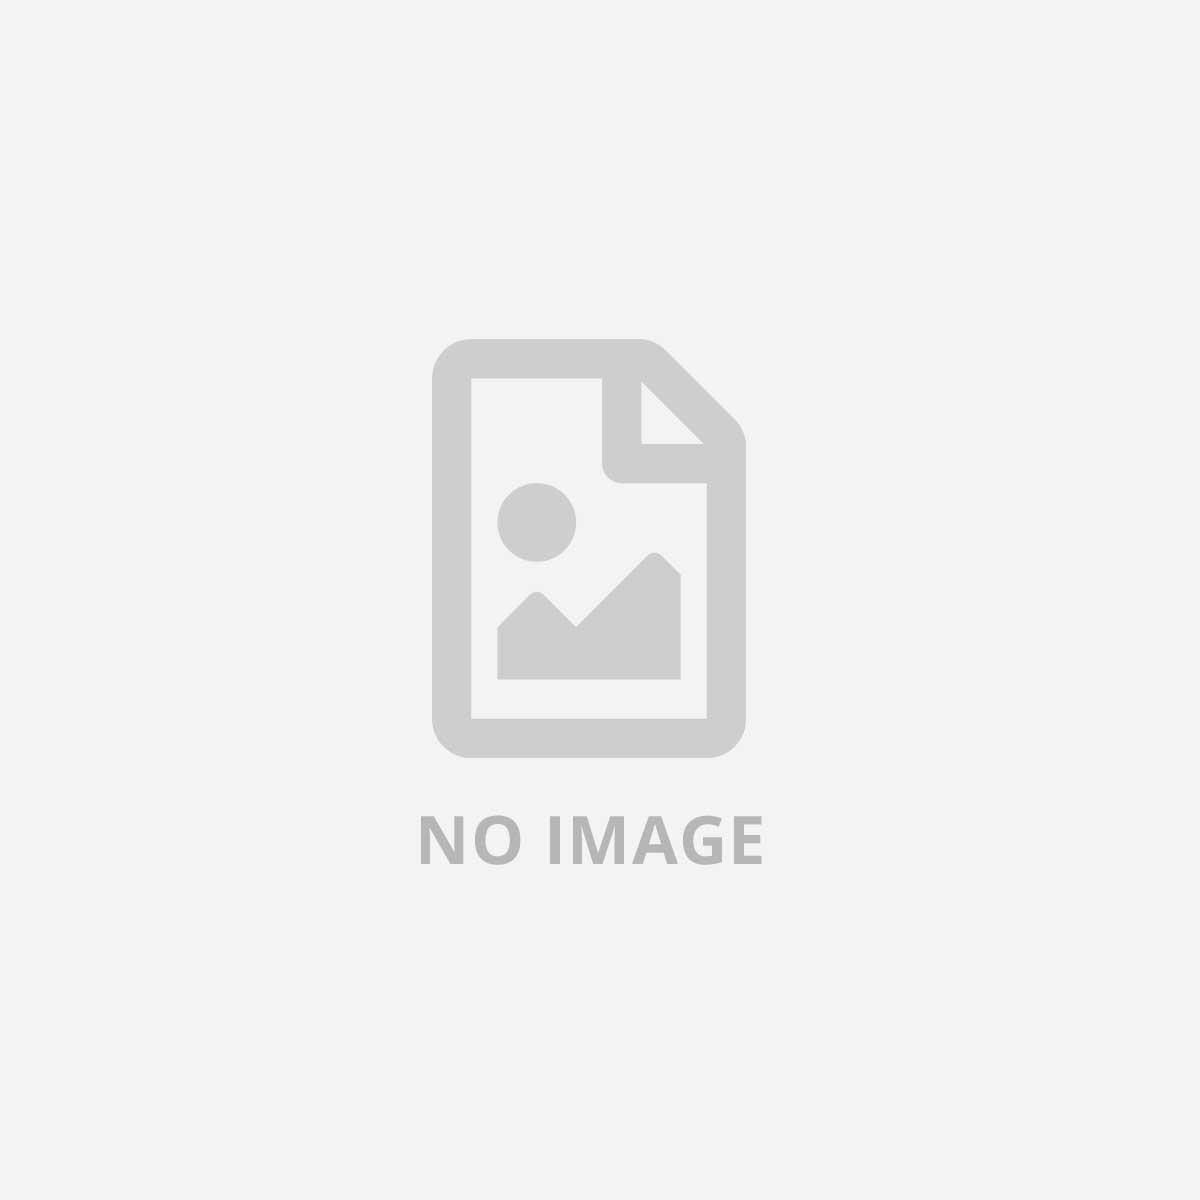 SONY WALKMAN MP3 E394 NERO